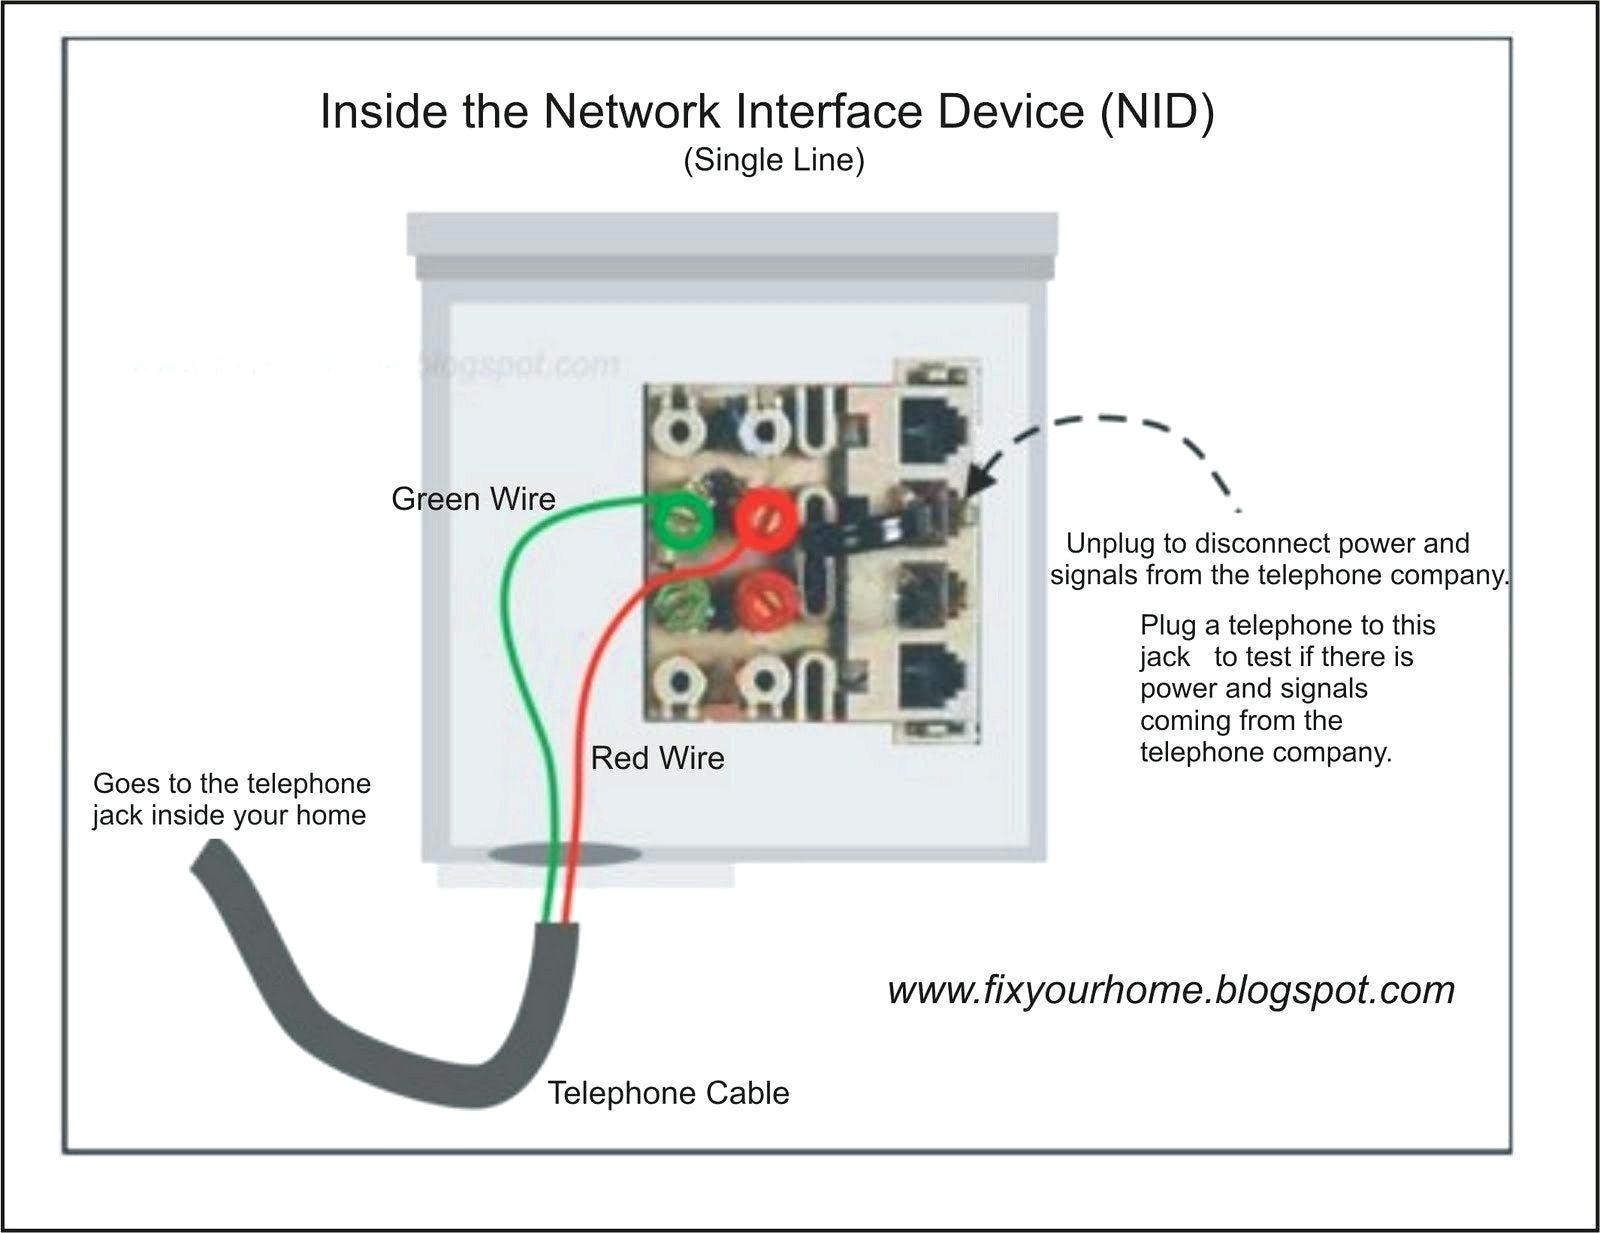 Speaker Cabinet Wiring Diagram Elegant Image Free Download Lace Sensor Schematics Kobecityinfo Wp Content 2018 07 U Vers Rh Dxruptive Co Jack Schematic